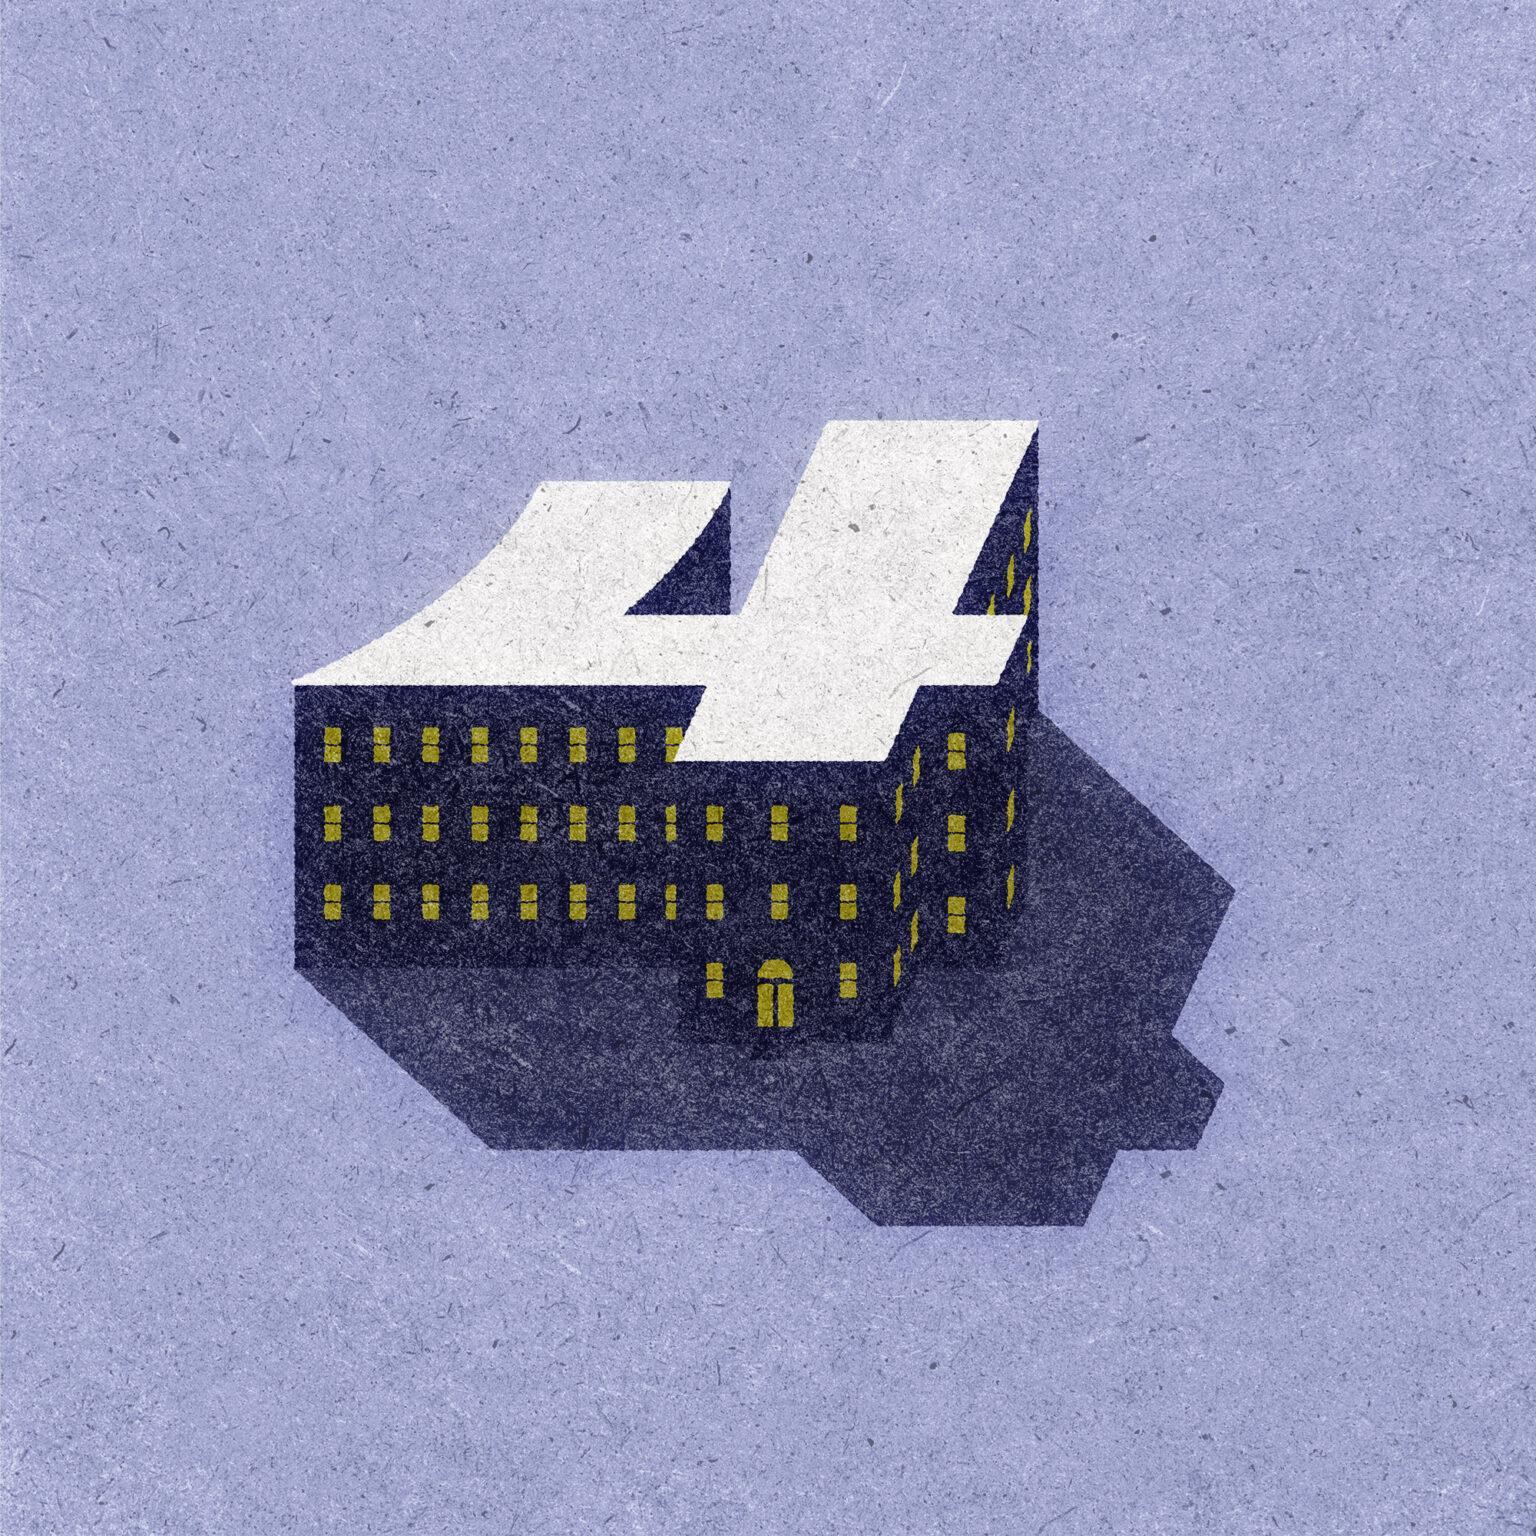 ATC Artist Series Paul Engel Letter Numerals